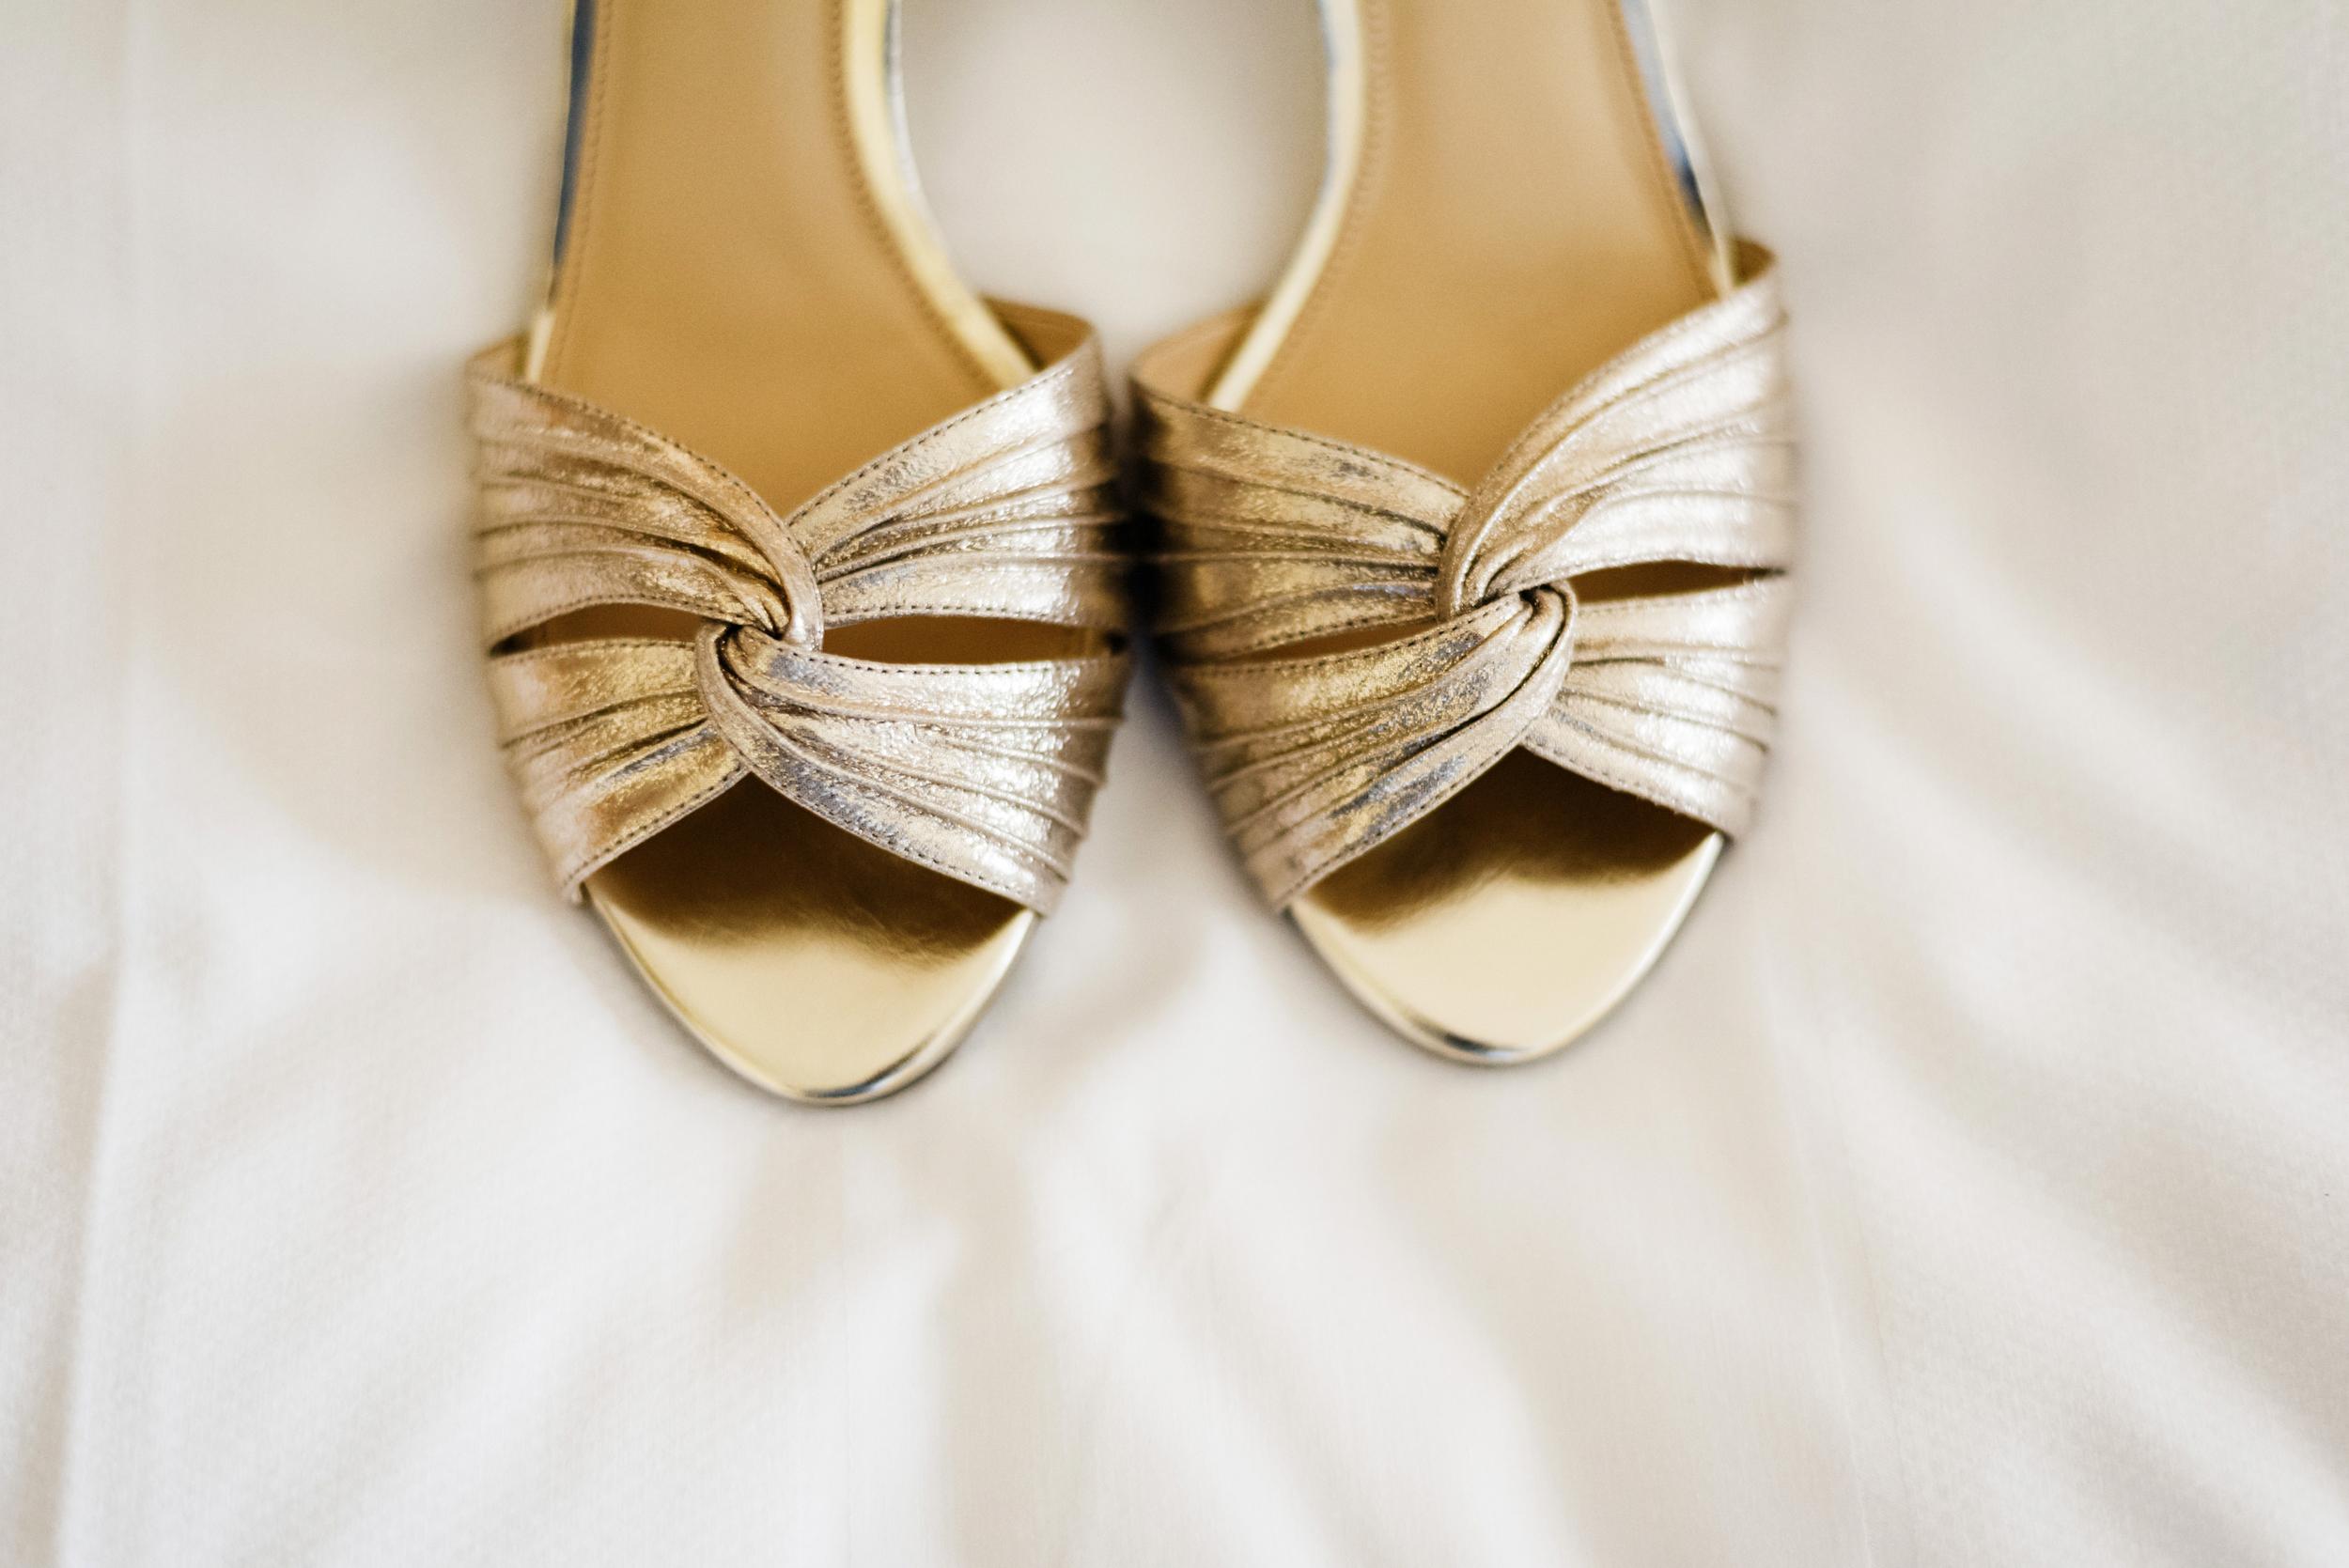 Gold Wedding Shoes | Joe and Patience Photography | Filipino Wedding Planner | Seattle Wedding Planner | Ballard Bay Club Wedding